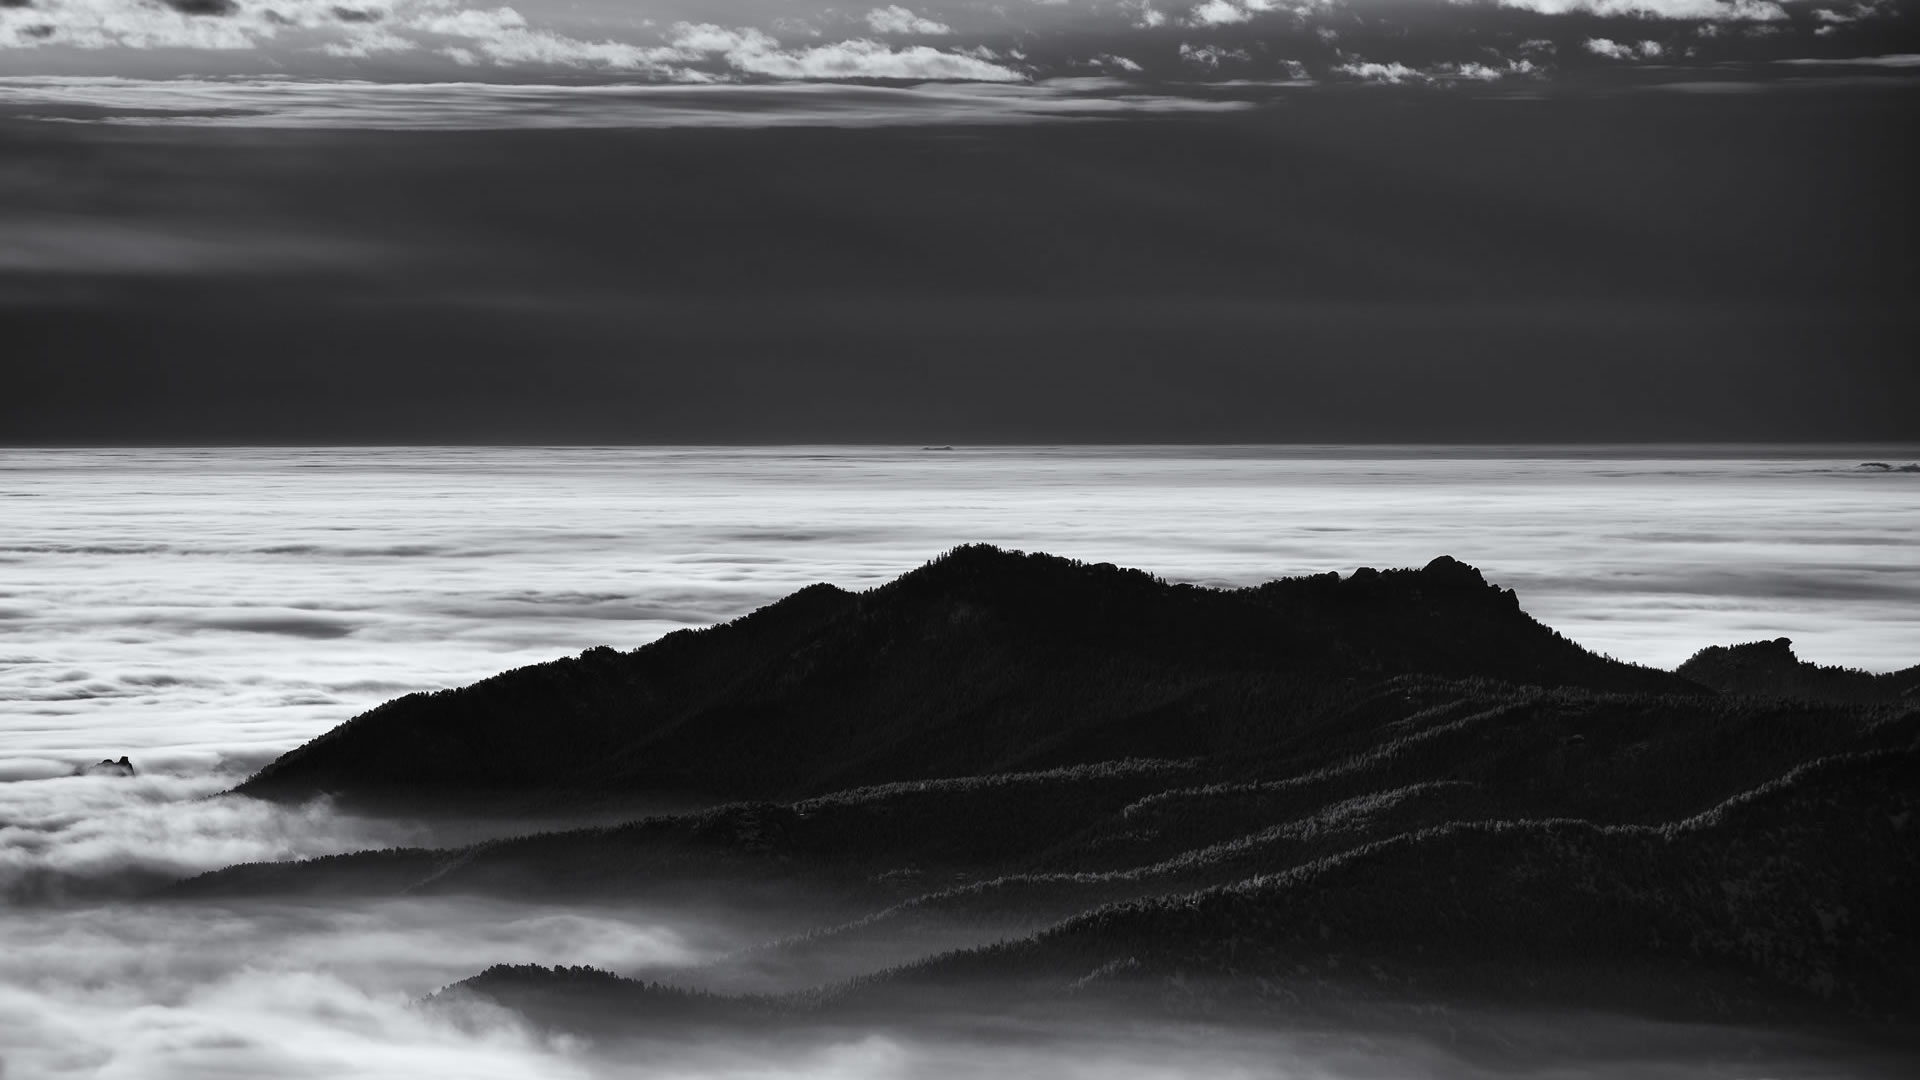 Daniel-Joder-Green-Mountain-Above-The-Fog